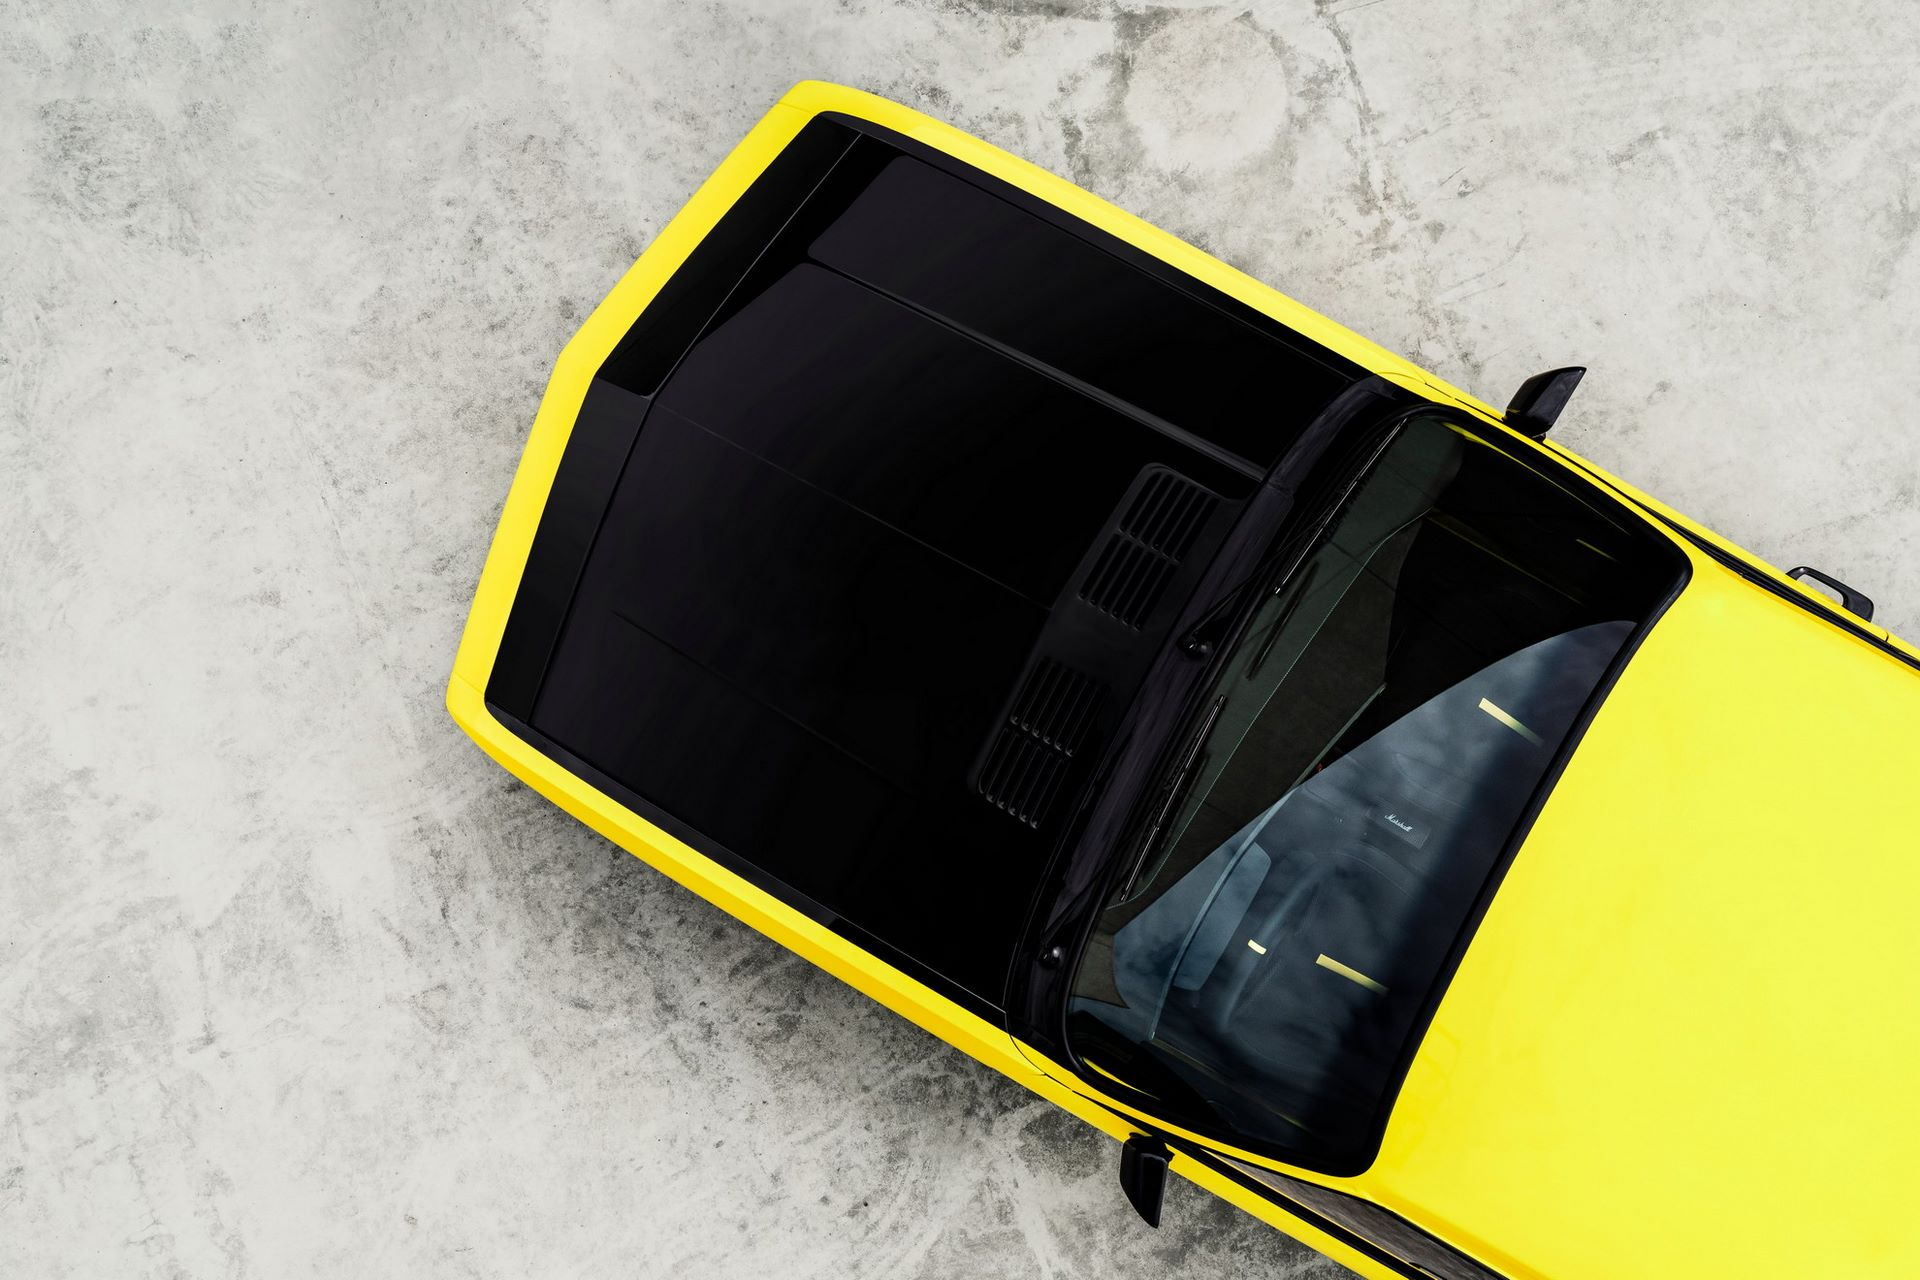 Opel-Manta-GSe-ElektroMOD-15